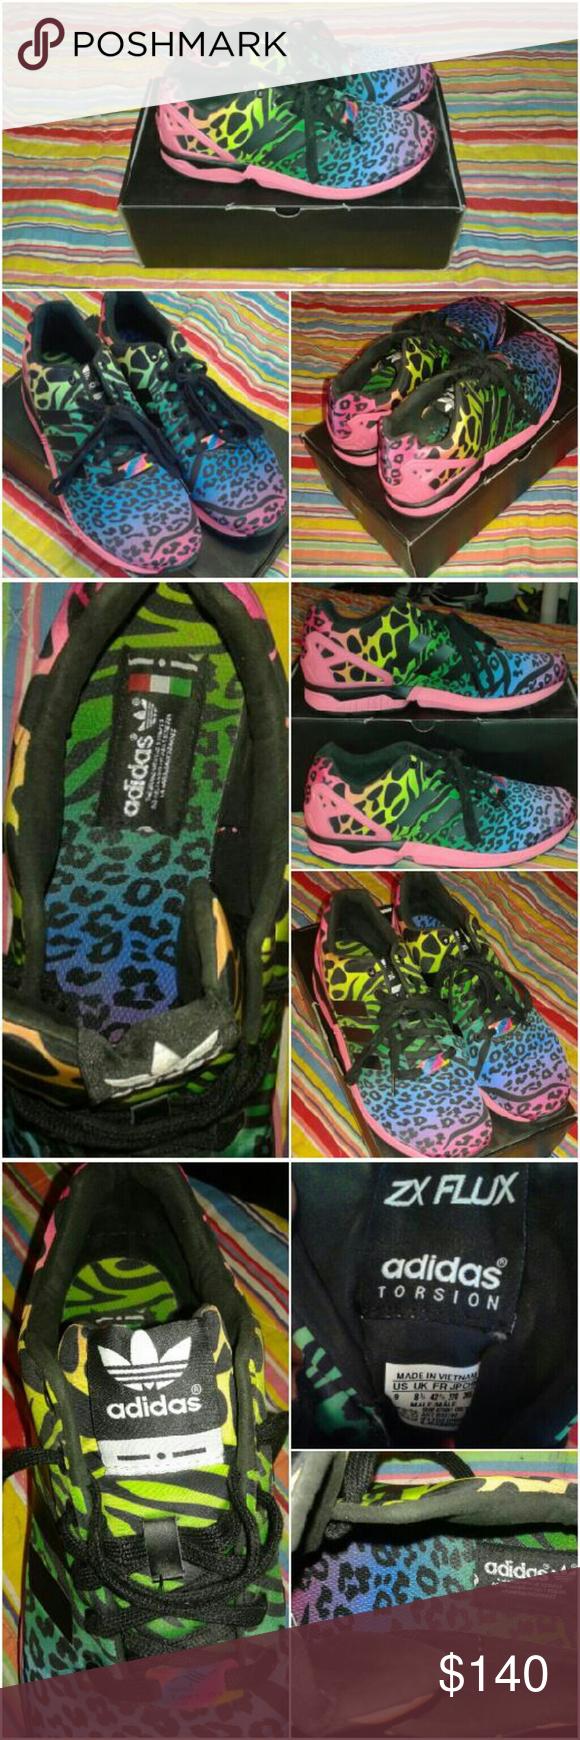 dcdaf5df509d4 ... b32740 unisex shoes 3b3da 68396  ebay adidas x italia independent  rainbow safari zx flux very rare i call these my lisa